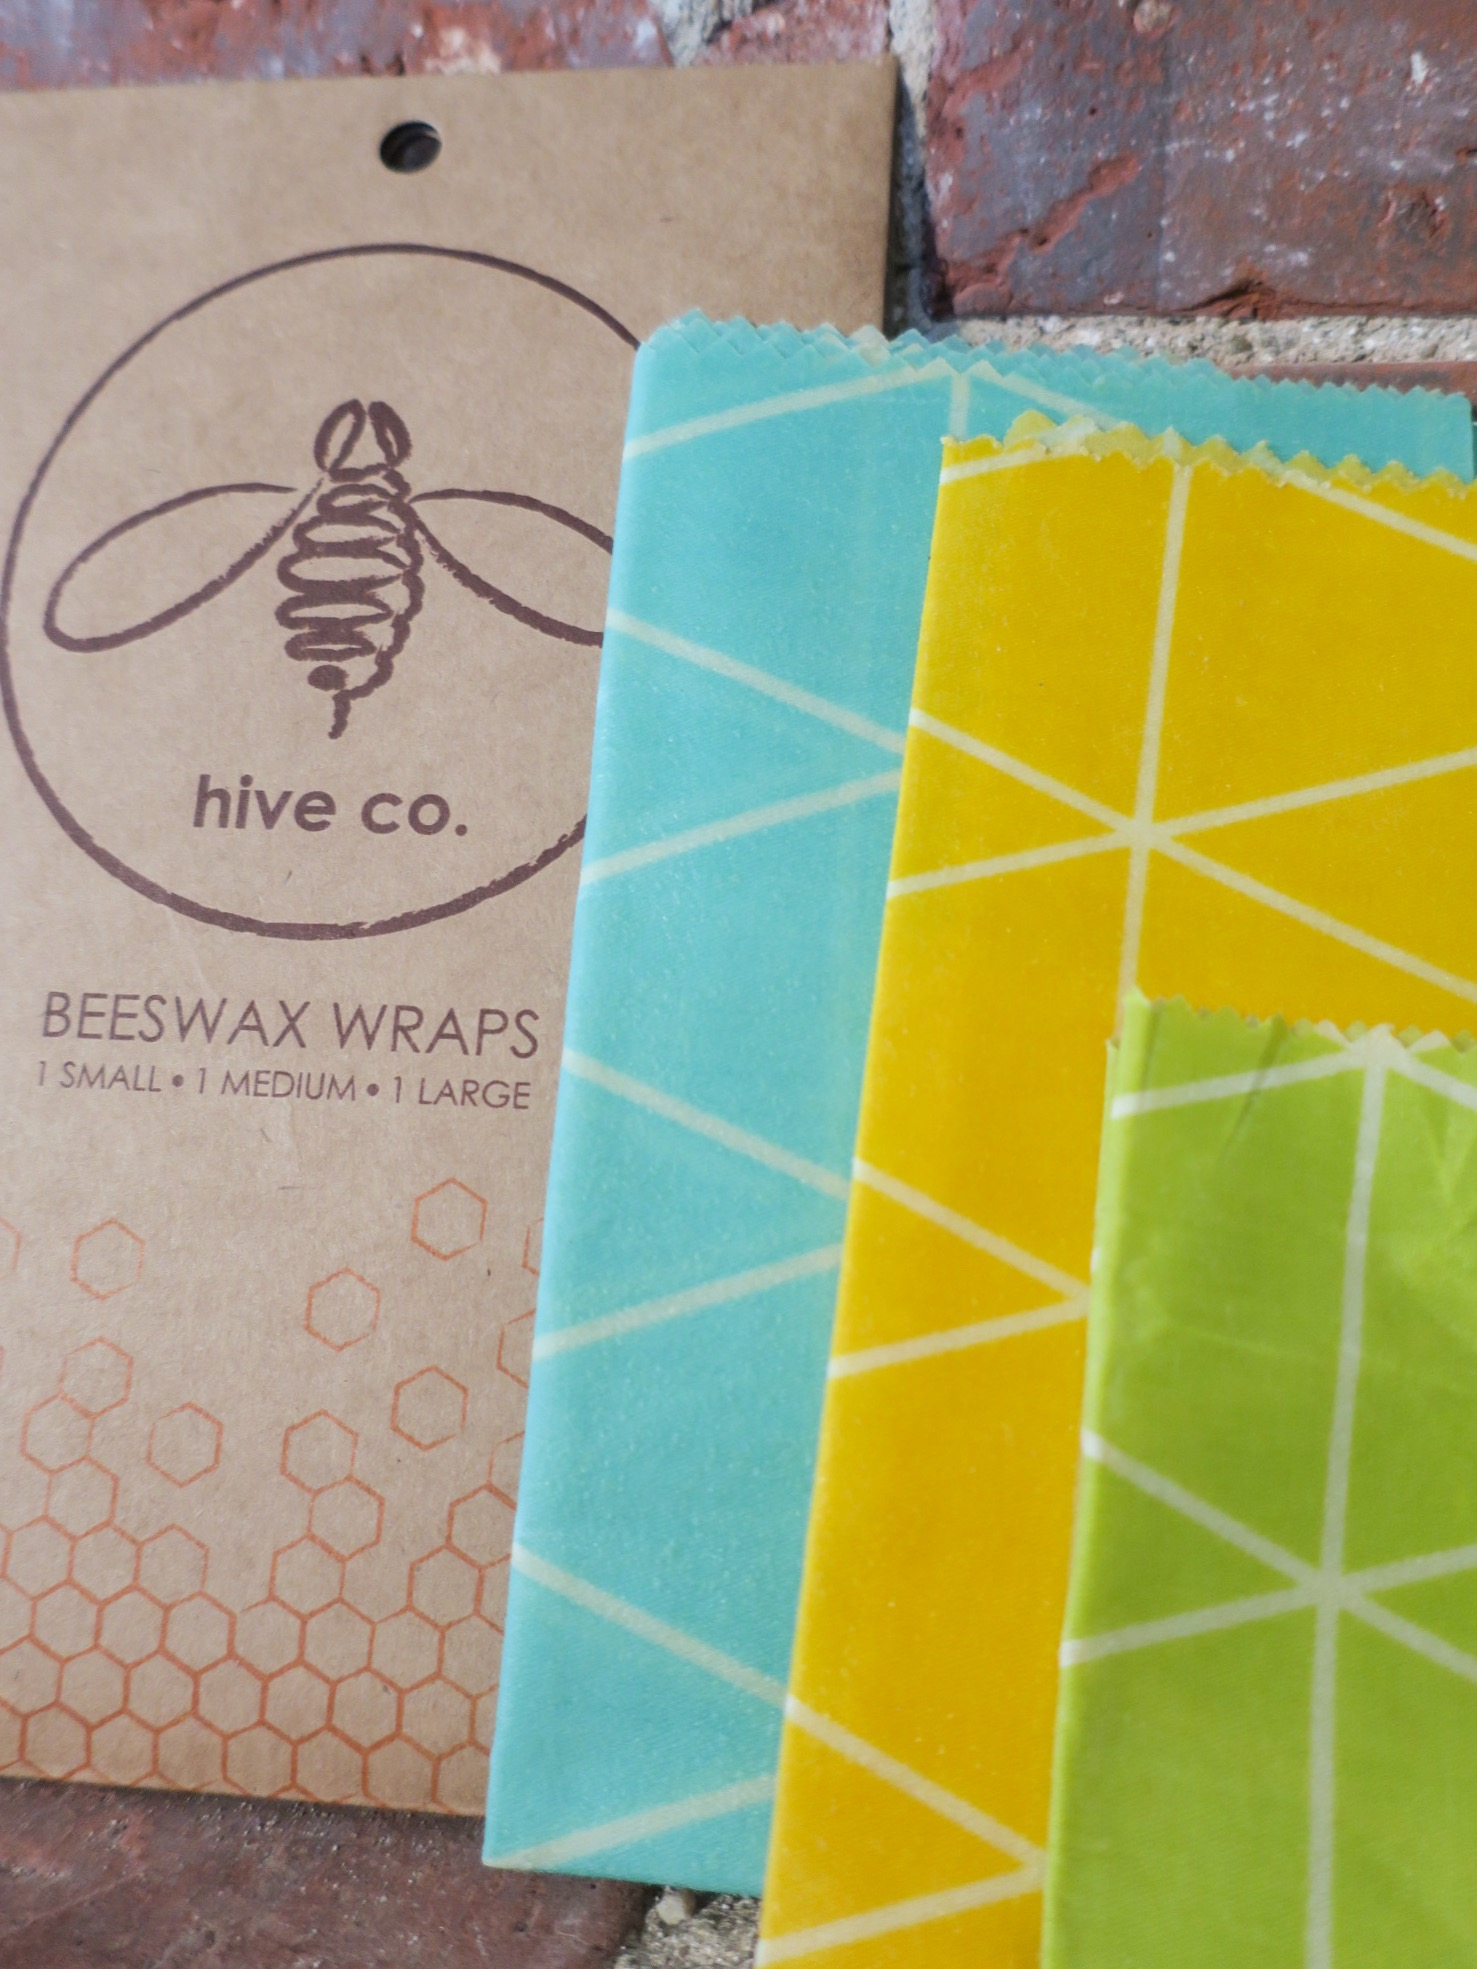 beeswax wrap food storage.JPEG